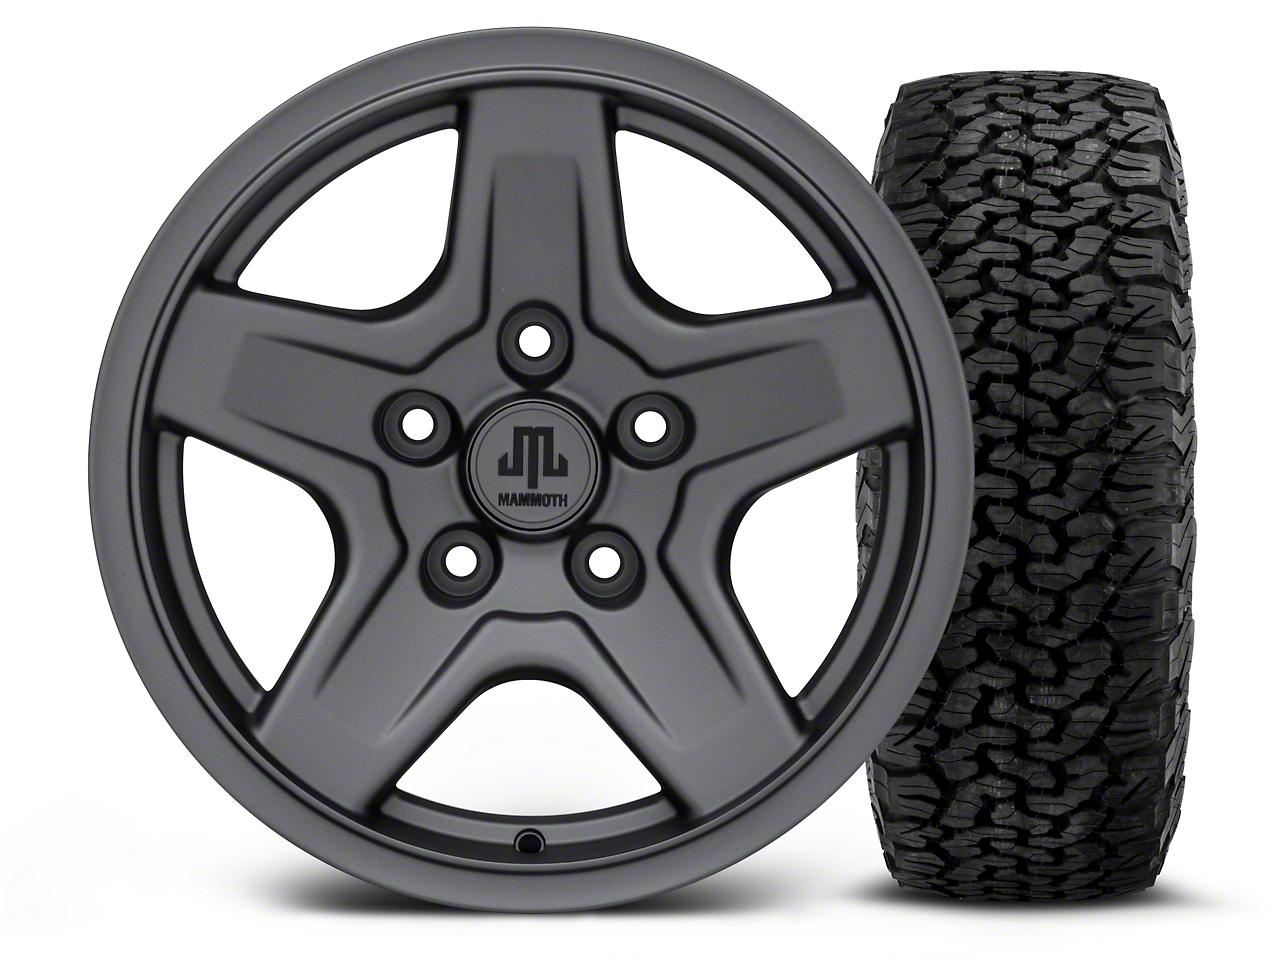 Mammoth Boulder Charcoal - 16x8 Wheel - and BF Goodrich All Terrain TA KO2 Tire - 305/70R16 (07-18 Jeep Wrangler JK; 2018 Jeep Wrangler JL)